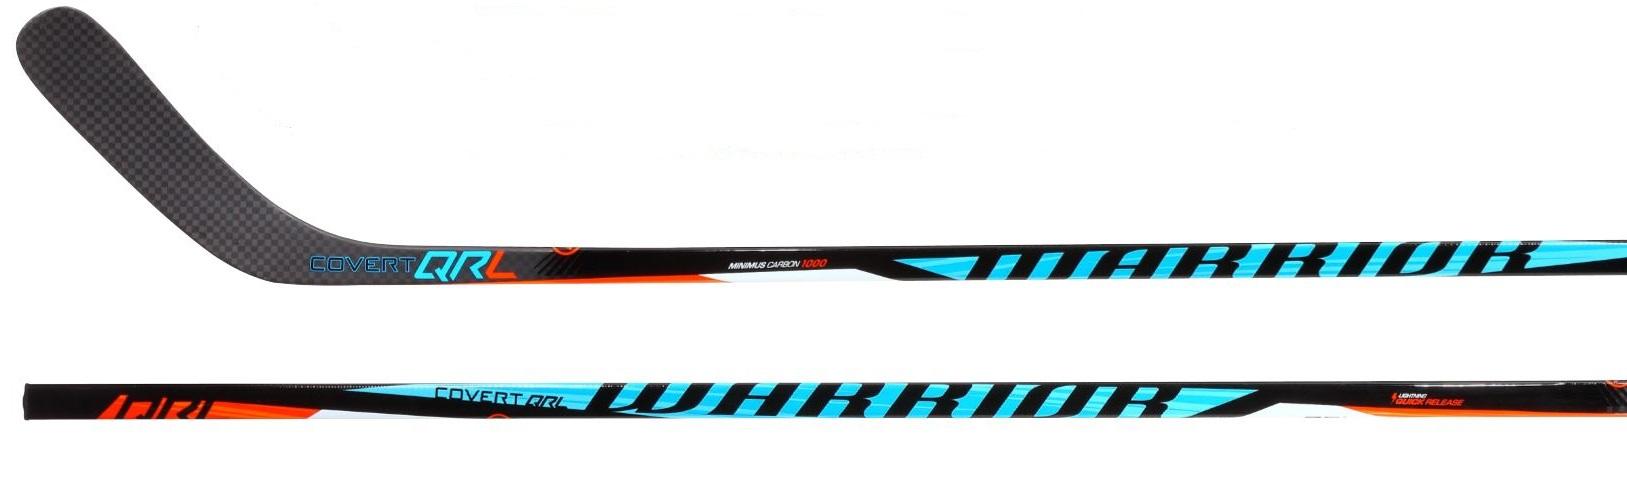 Warrior Covert QRL Stick – Hockey World Blog